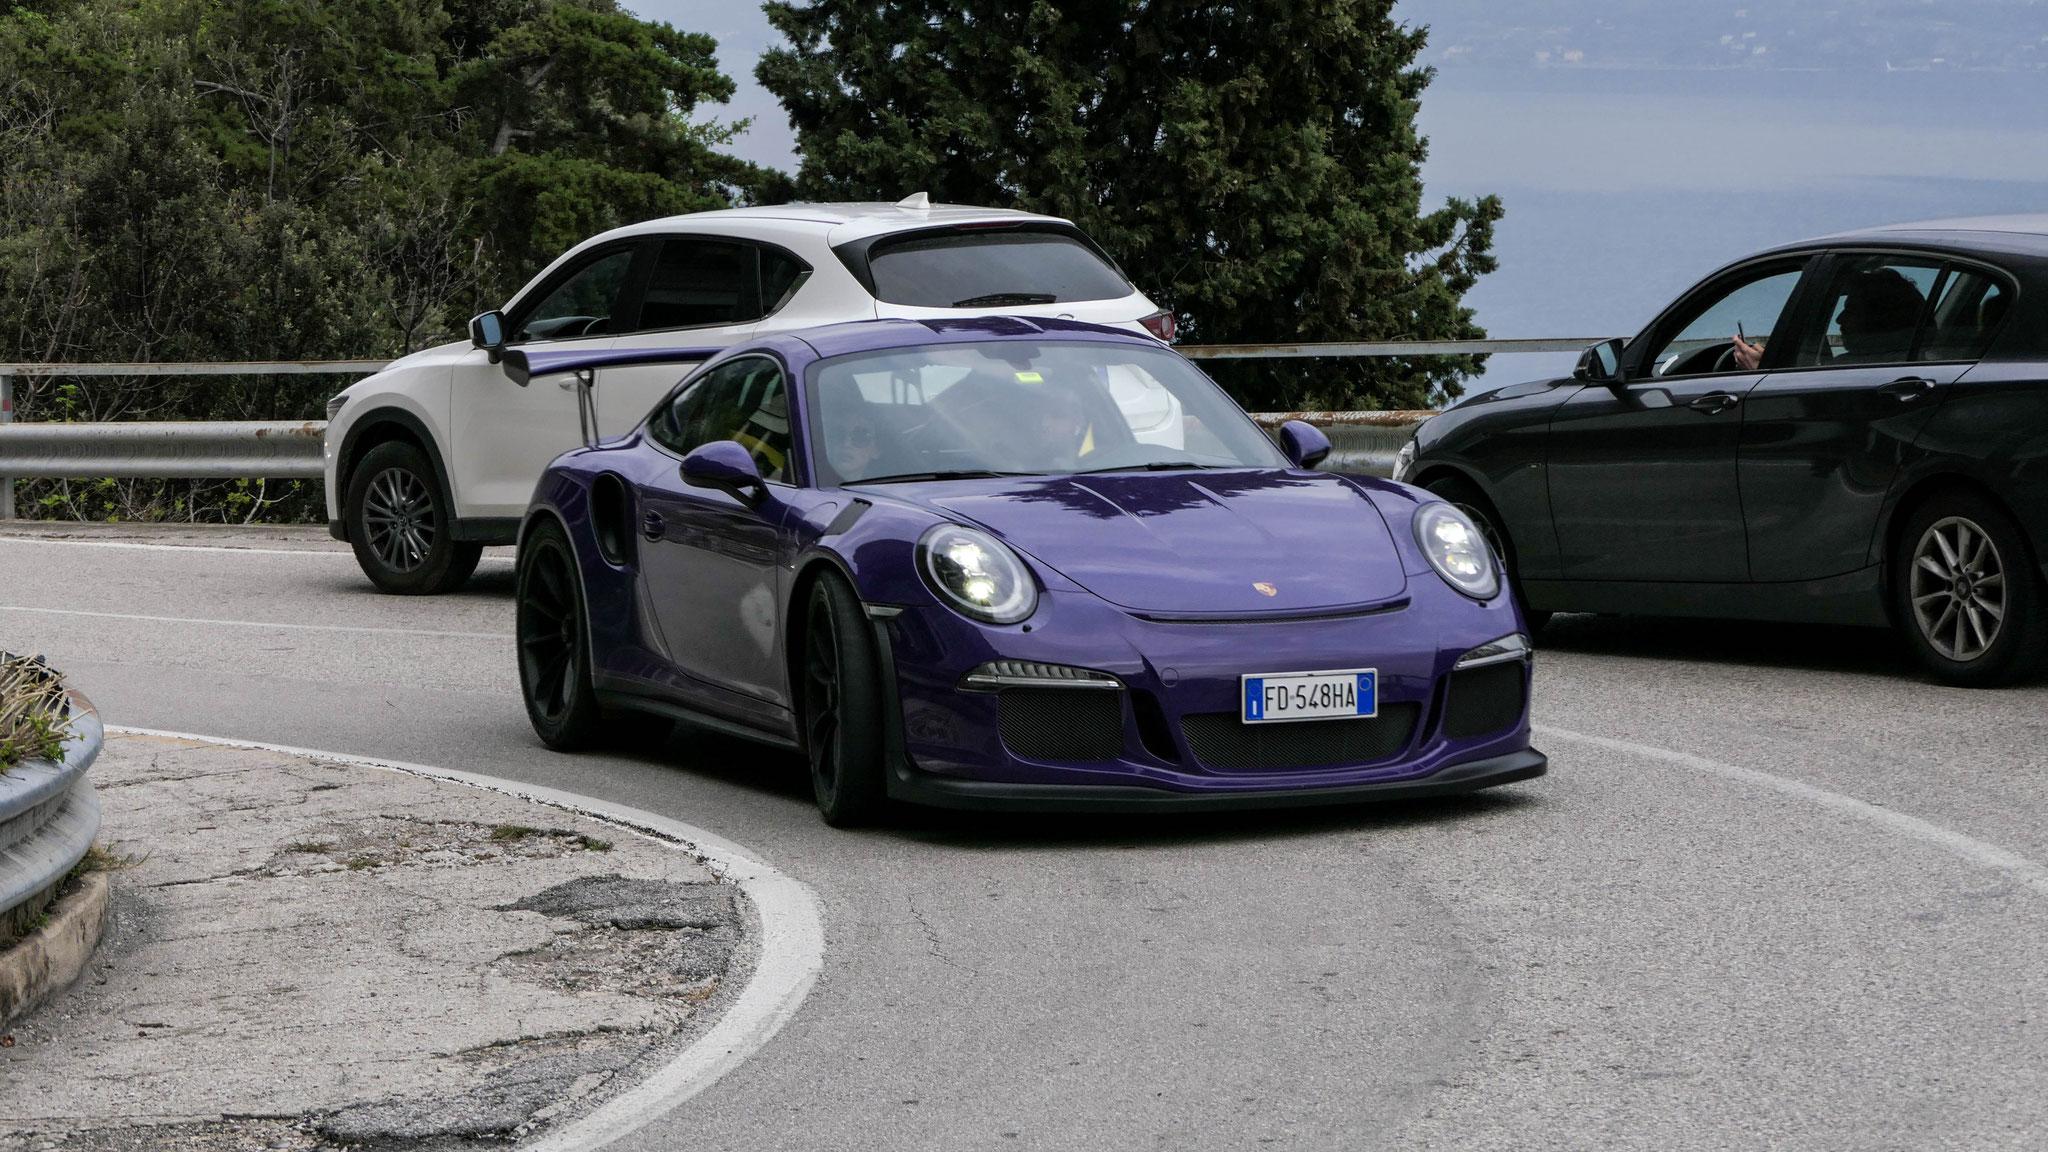 Porsche 911 GT3 RS - FD-548-HA (ITA)